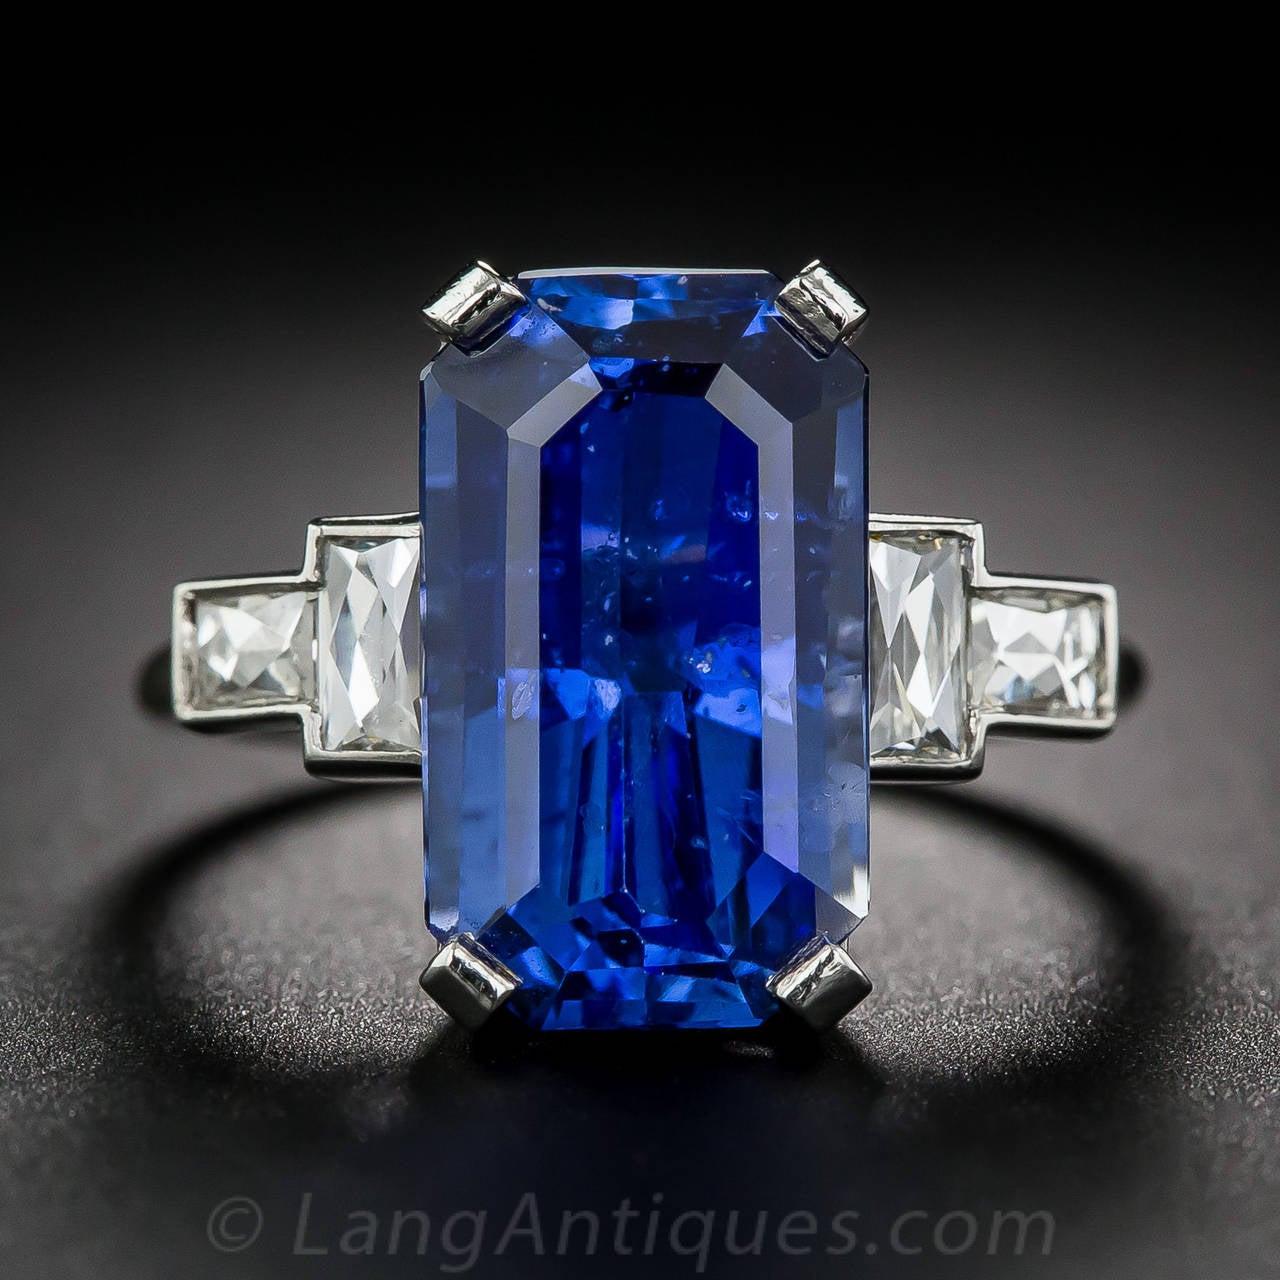 Carat Blue Diamond Solitaire Ring